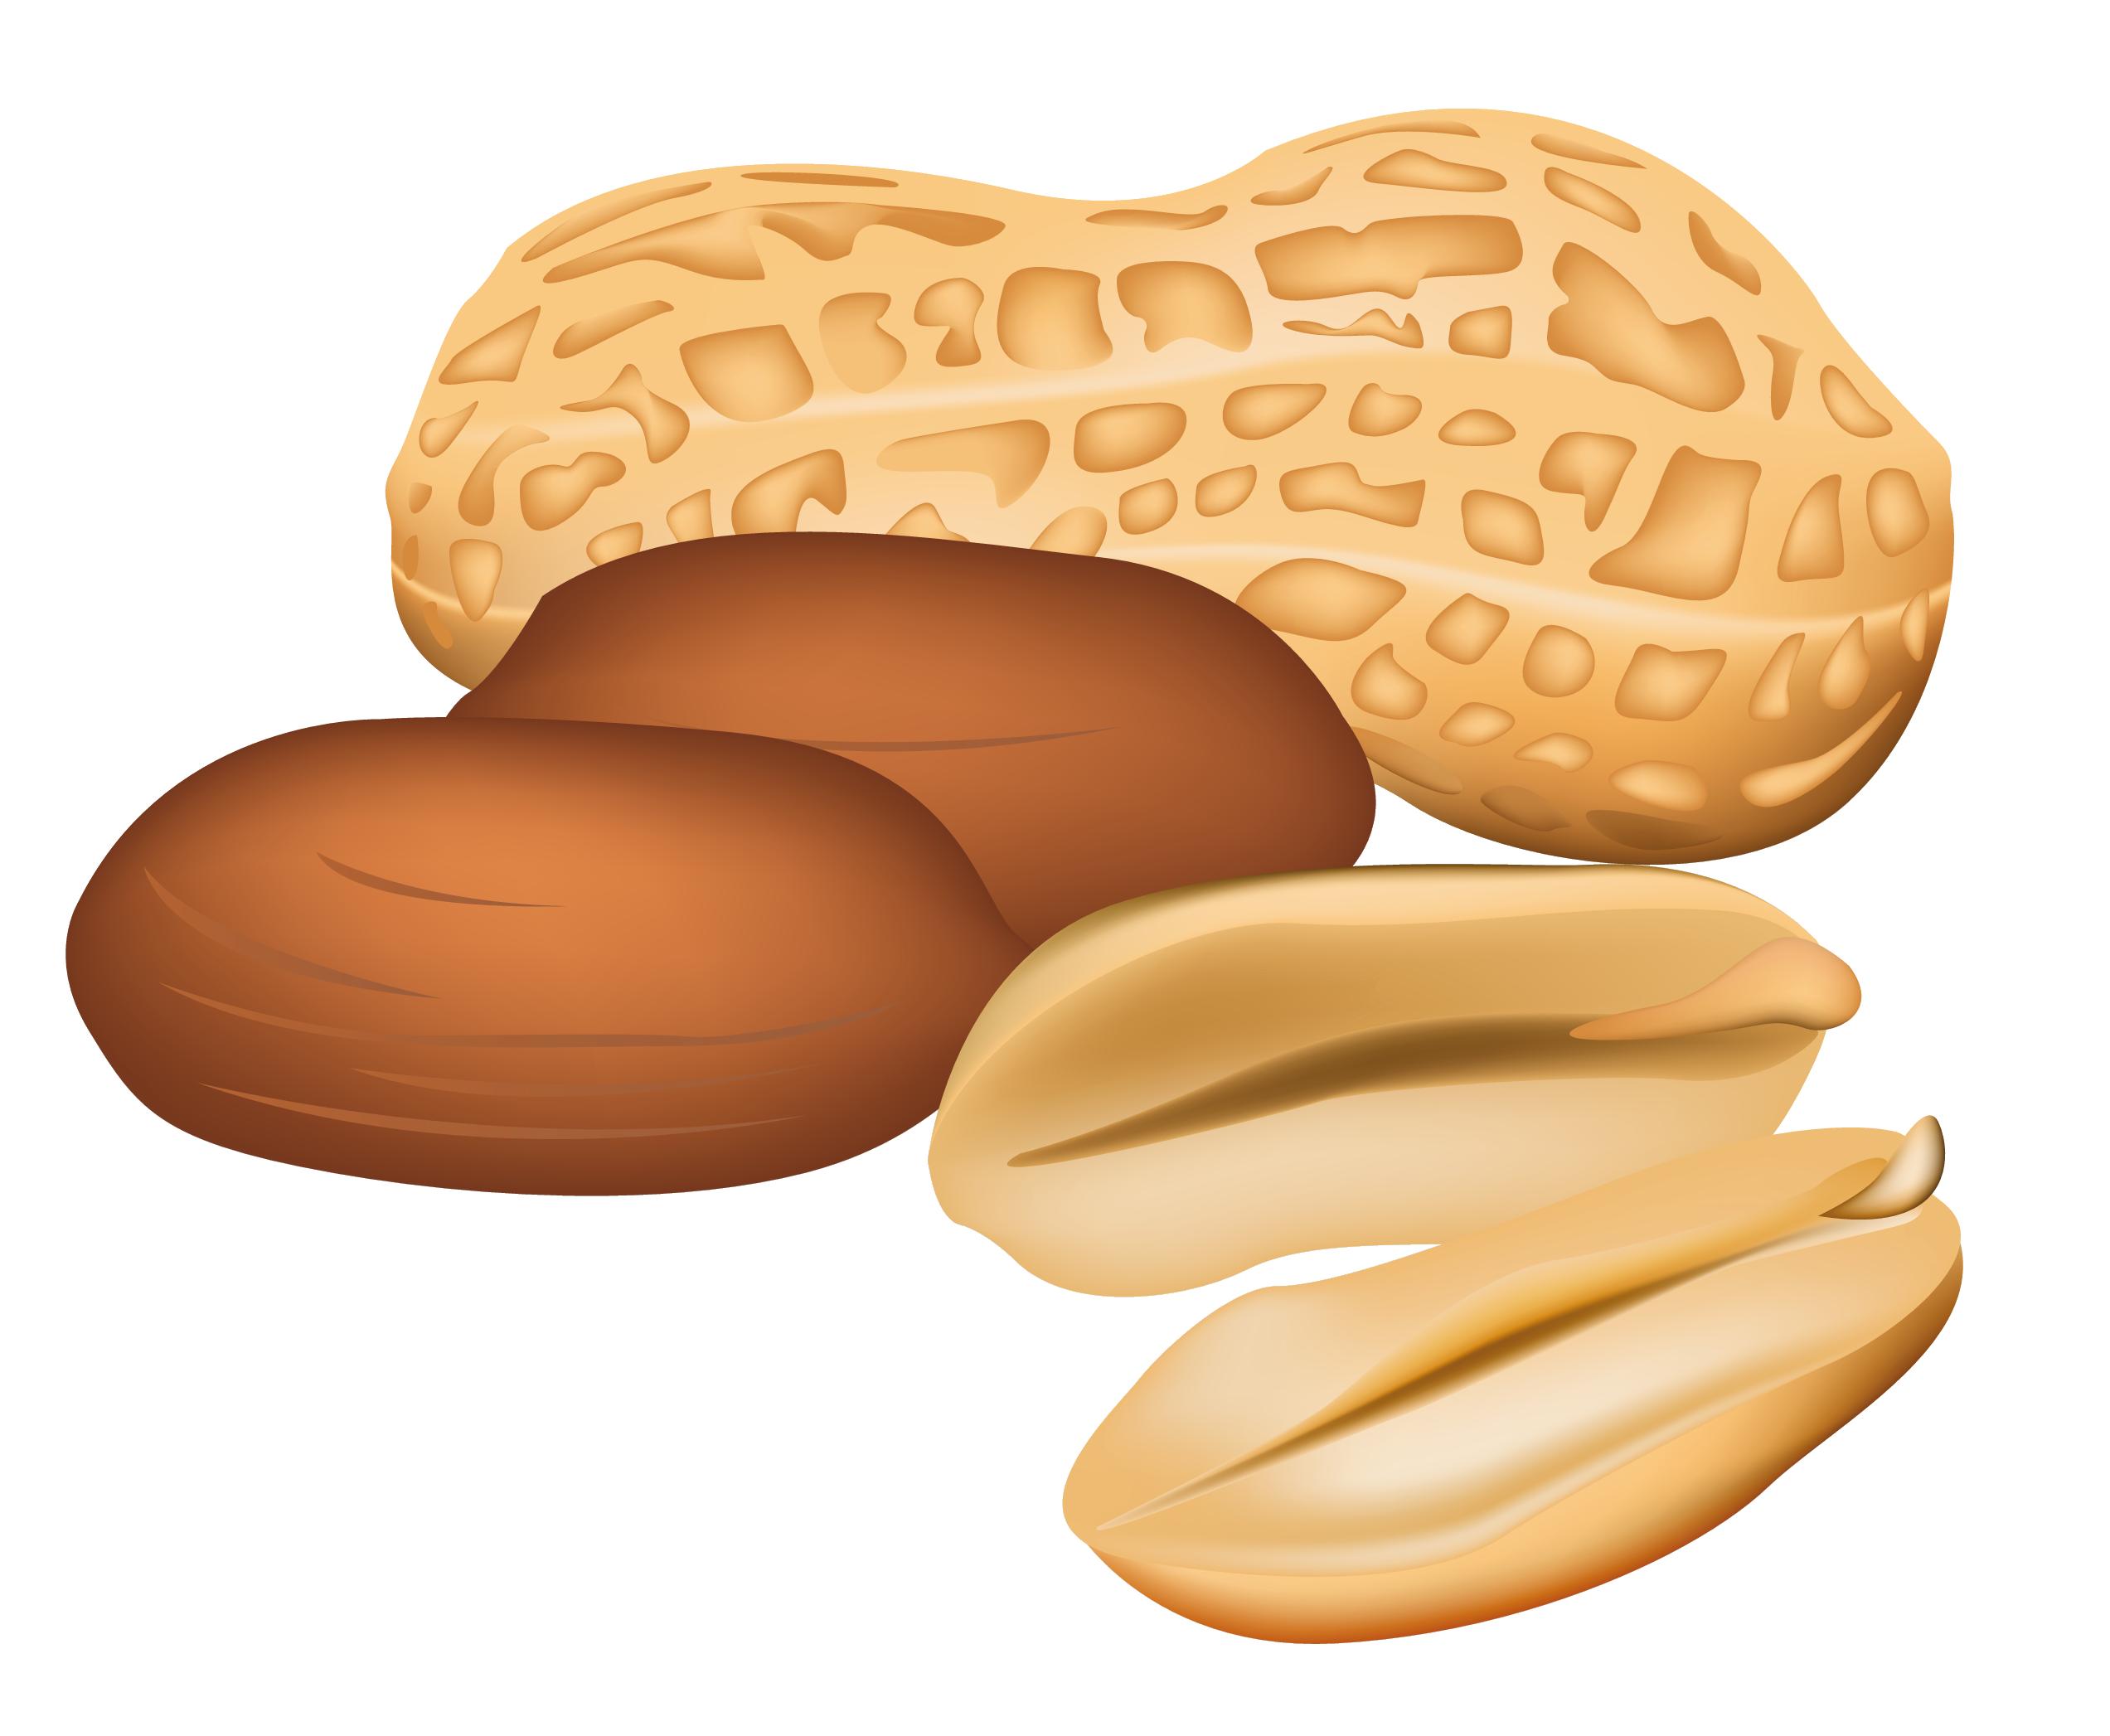 Peanut PNG - 11640